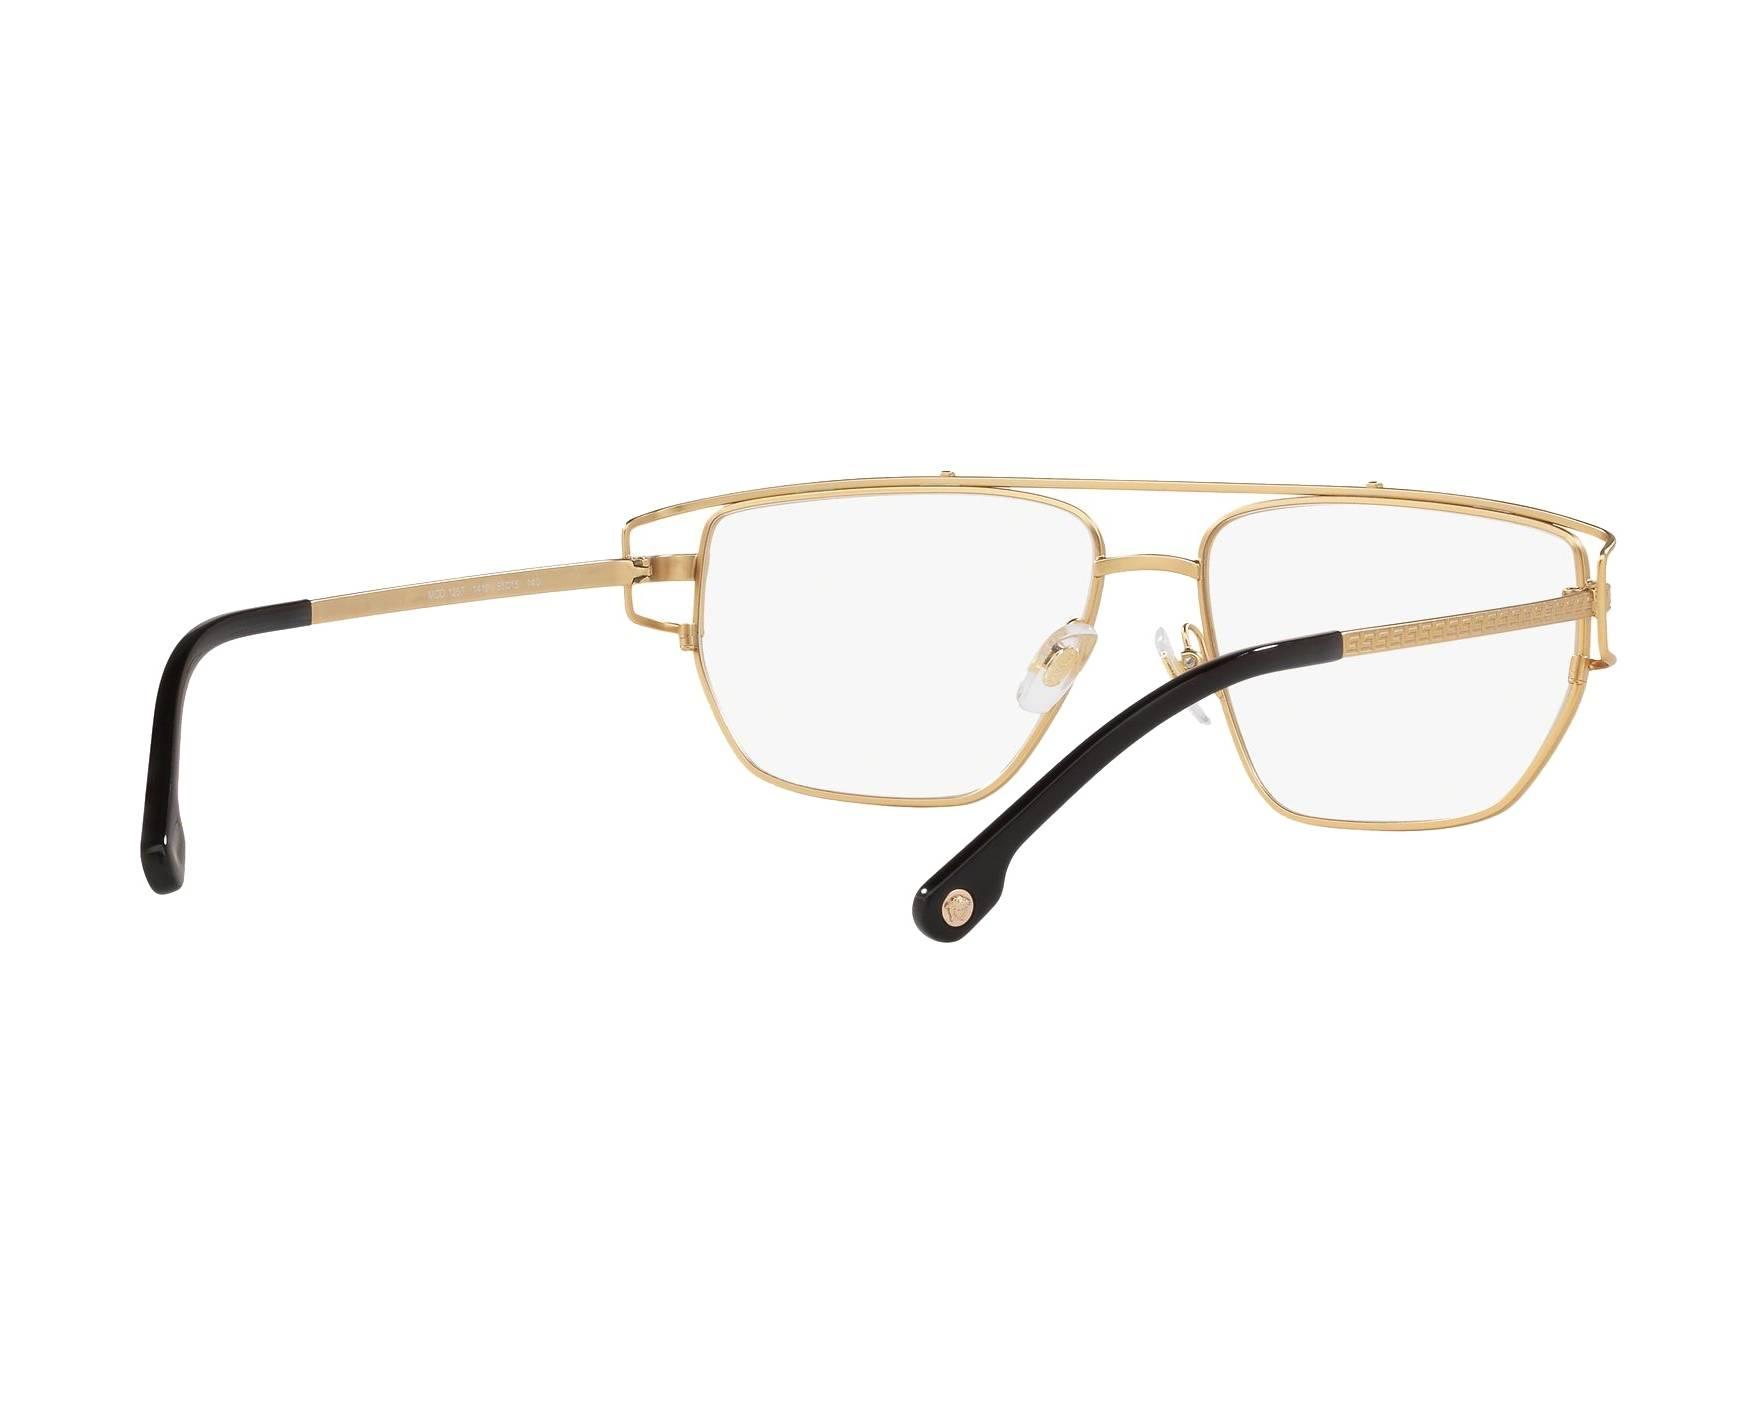 058677199c6 eyeglasses Versace VE-1257 1410 55-15 Gold 360 degree view 8